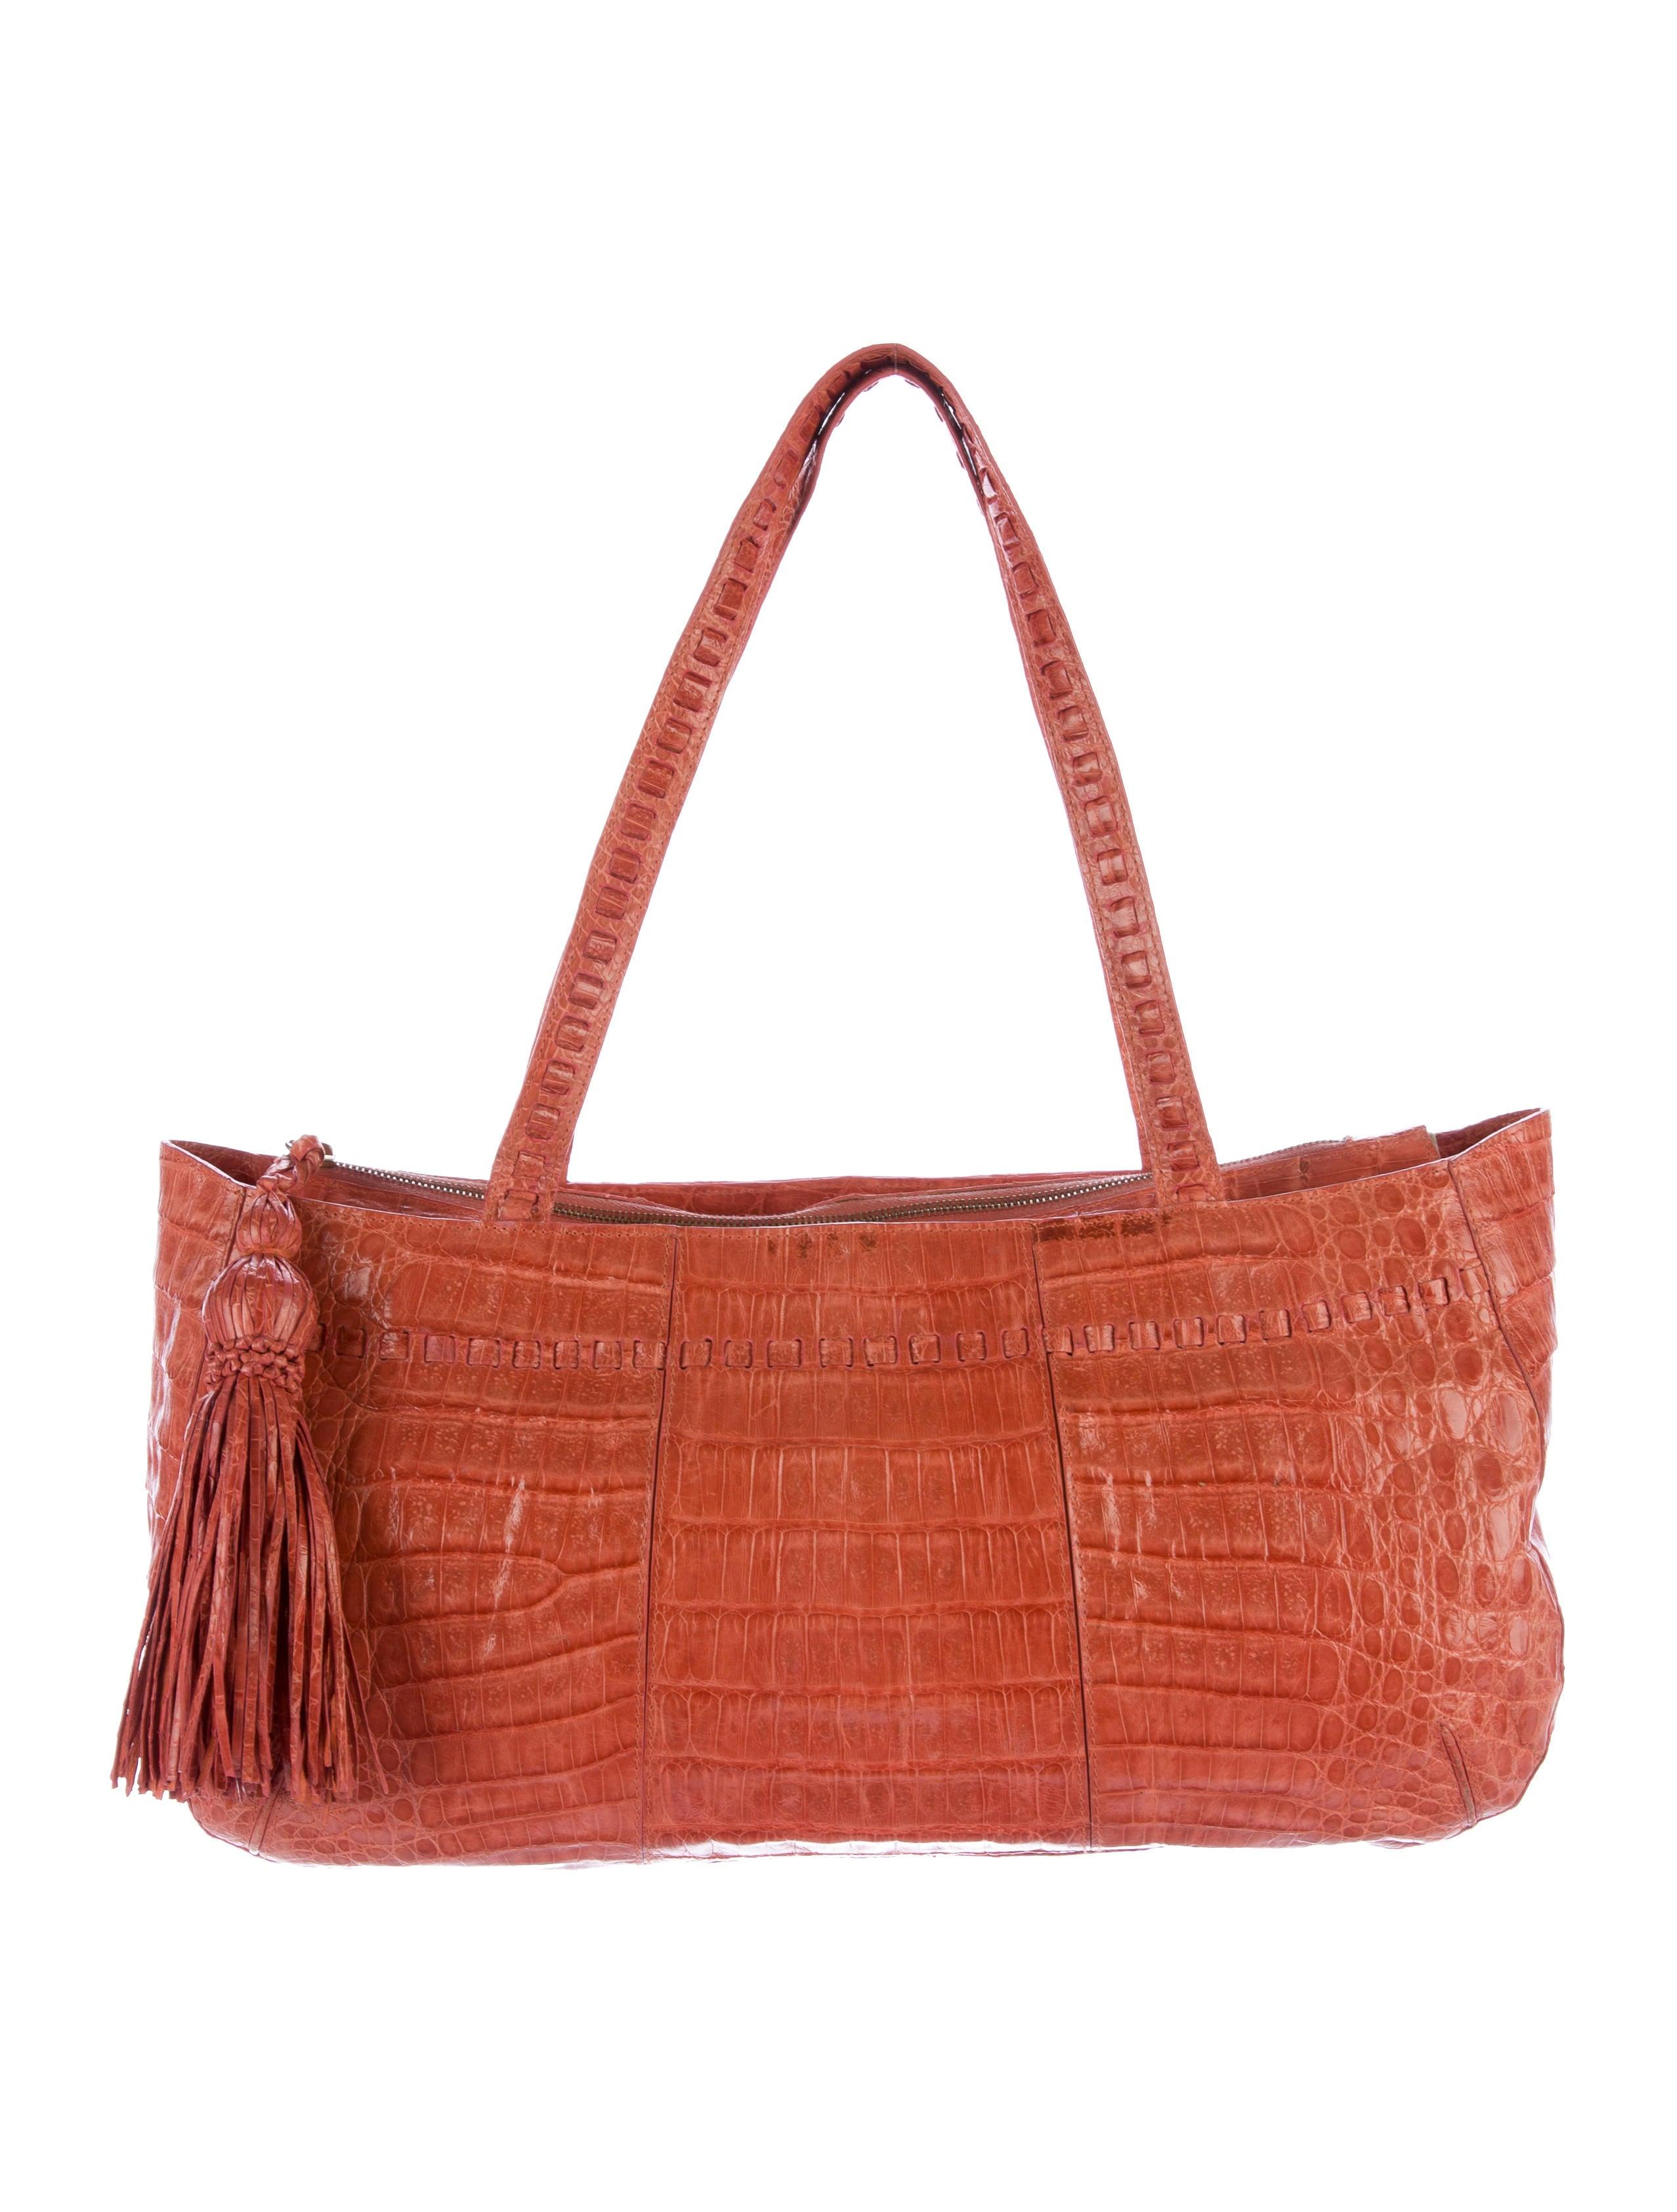 Nancy gonzalez crocodile tassel tote handbags nan23509 for Nancy gonzalez crocodile tote